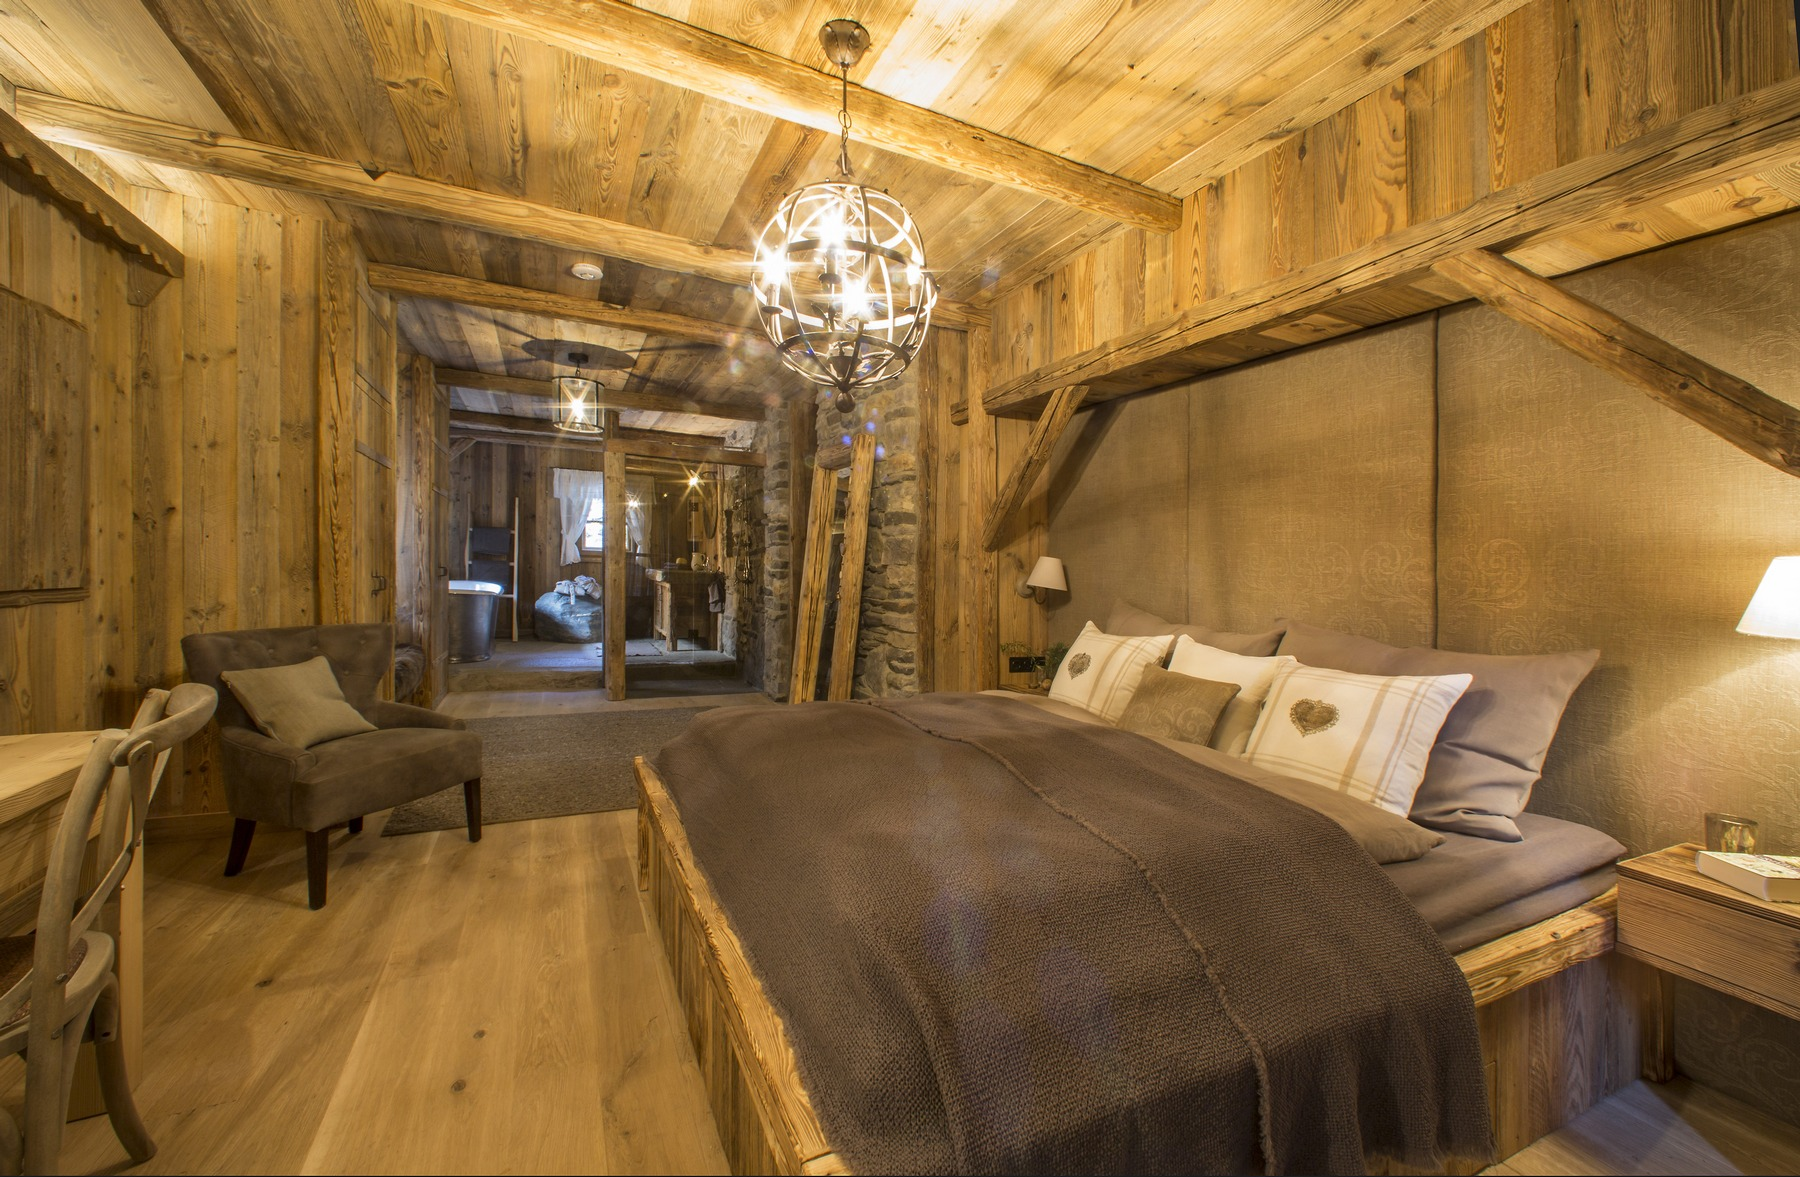 Jagd Haus in Tirol - Naturholzboden (Quelle: Home Interior)